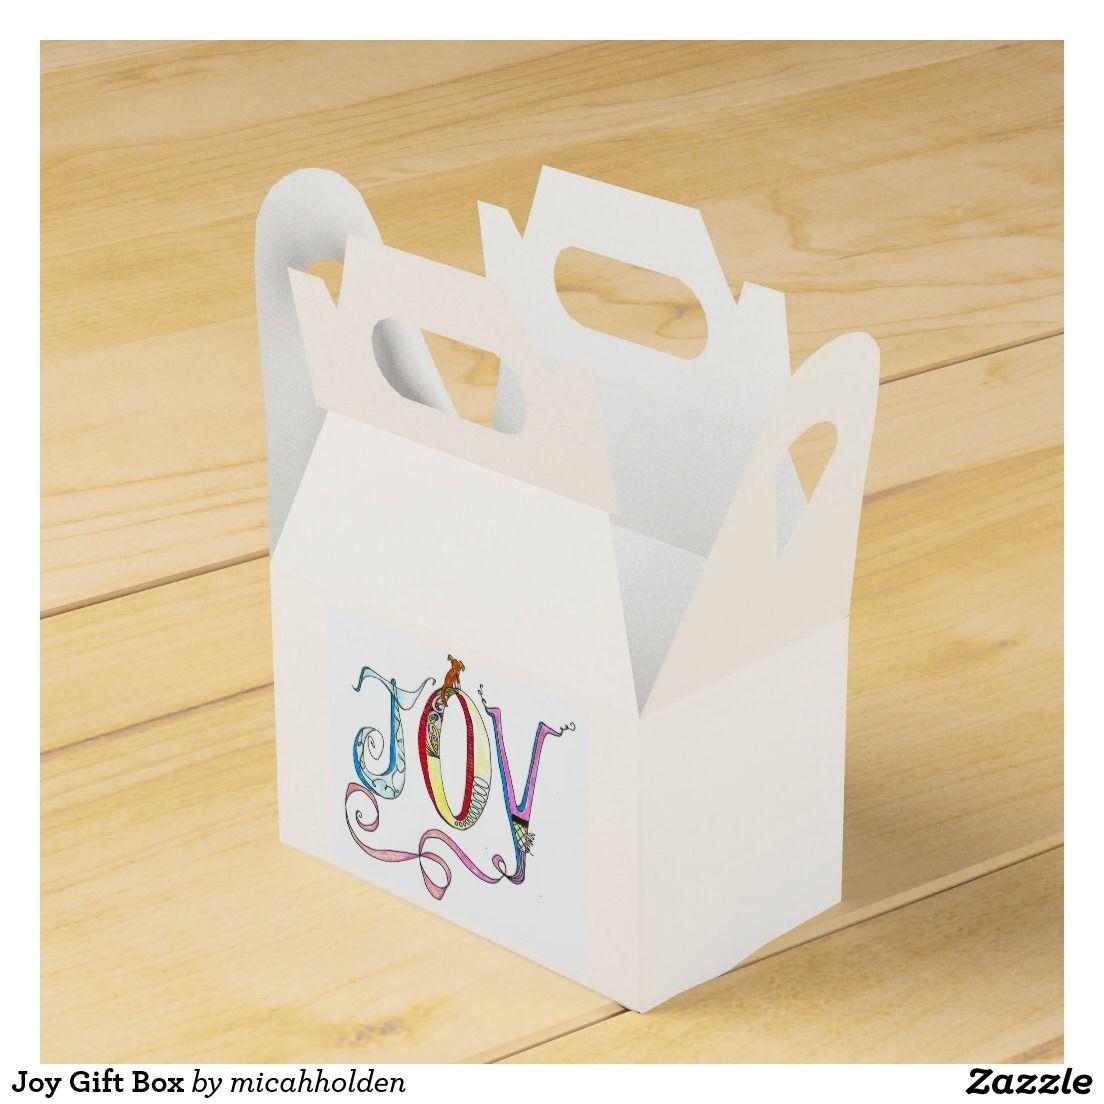 Joy Gift Box Party Favor Boxes | Micah Holden Art | Pinterest